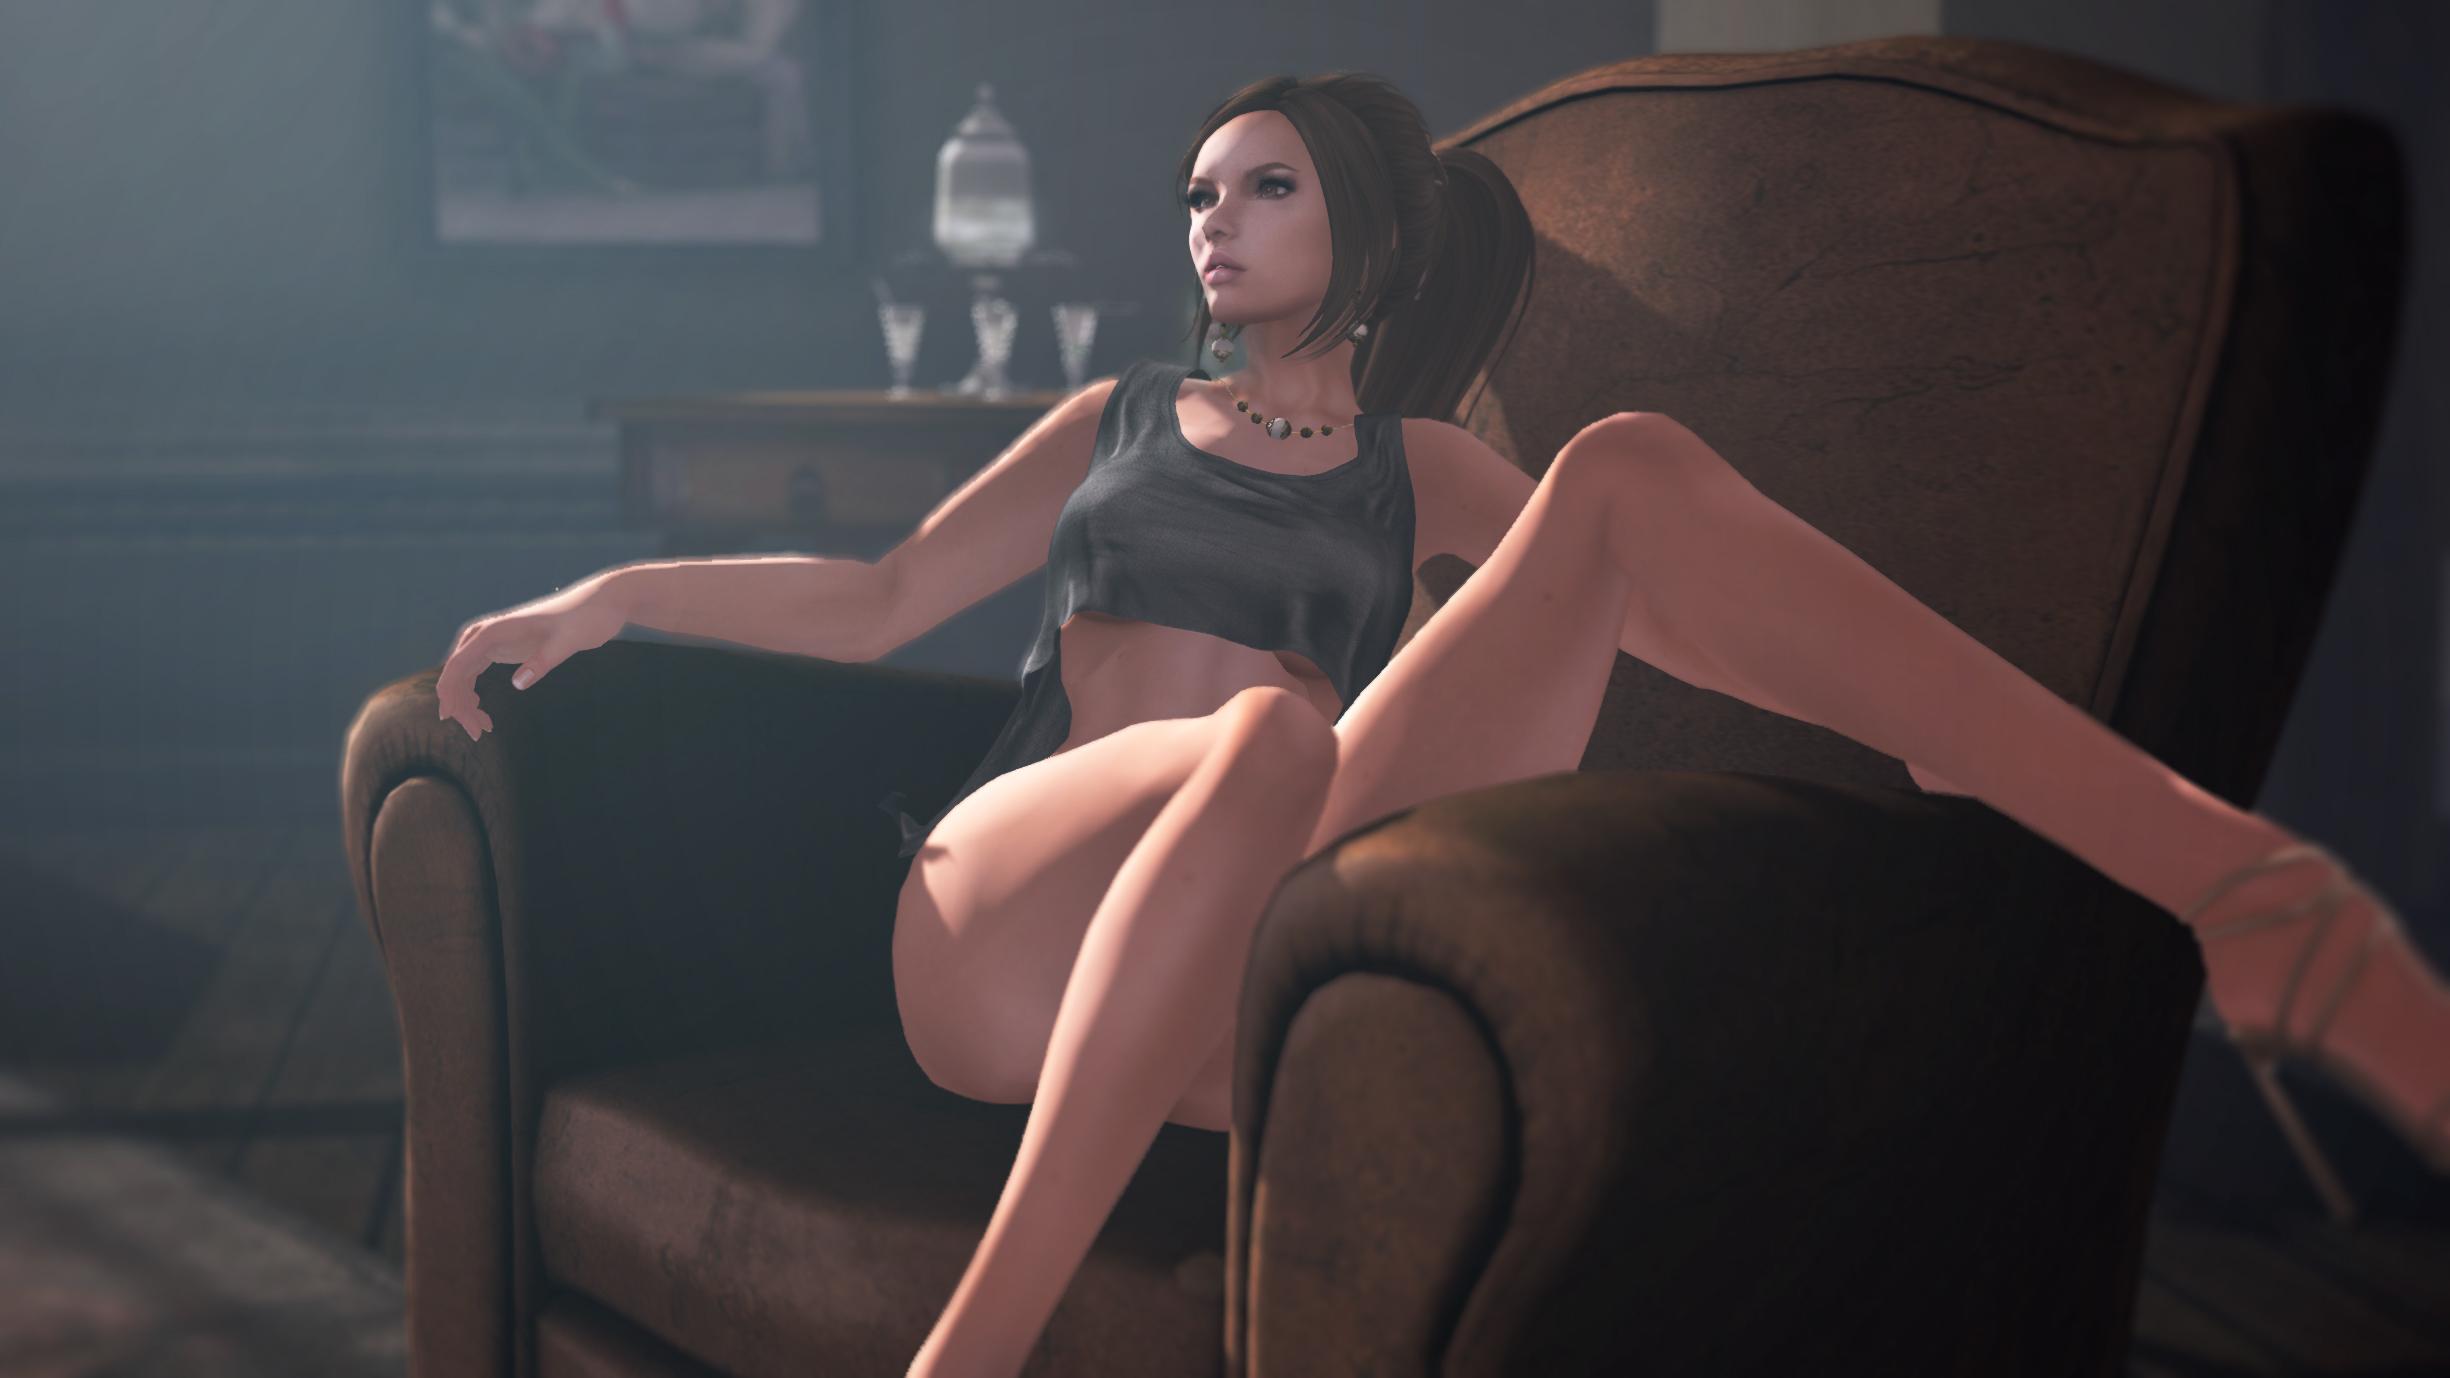 sexy signora porno foto gratis gay porno capezzoli